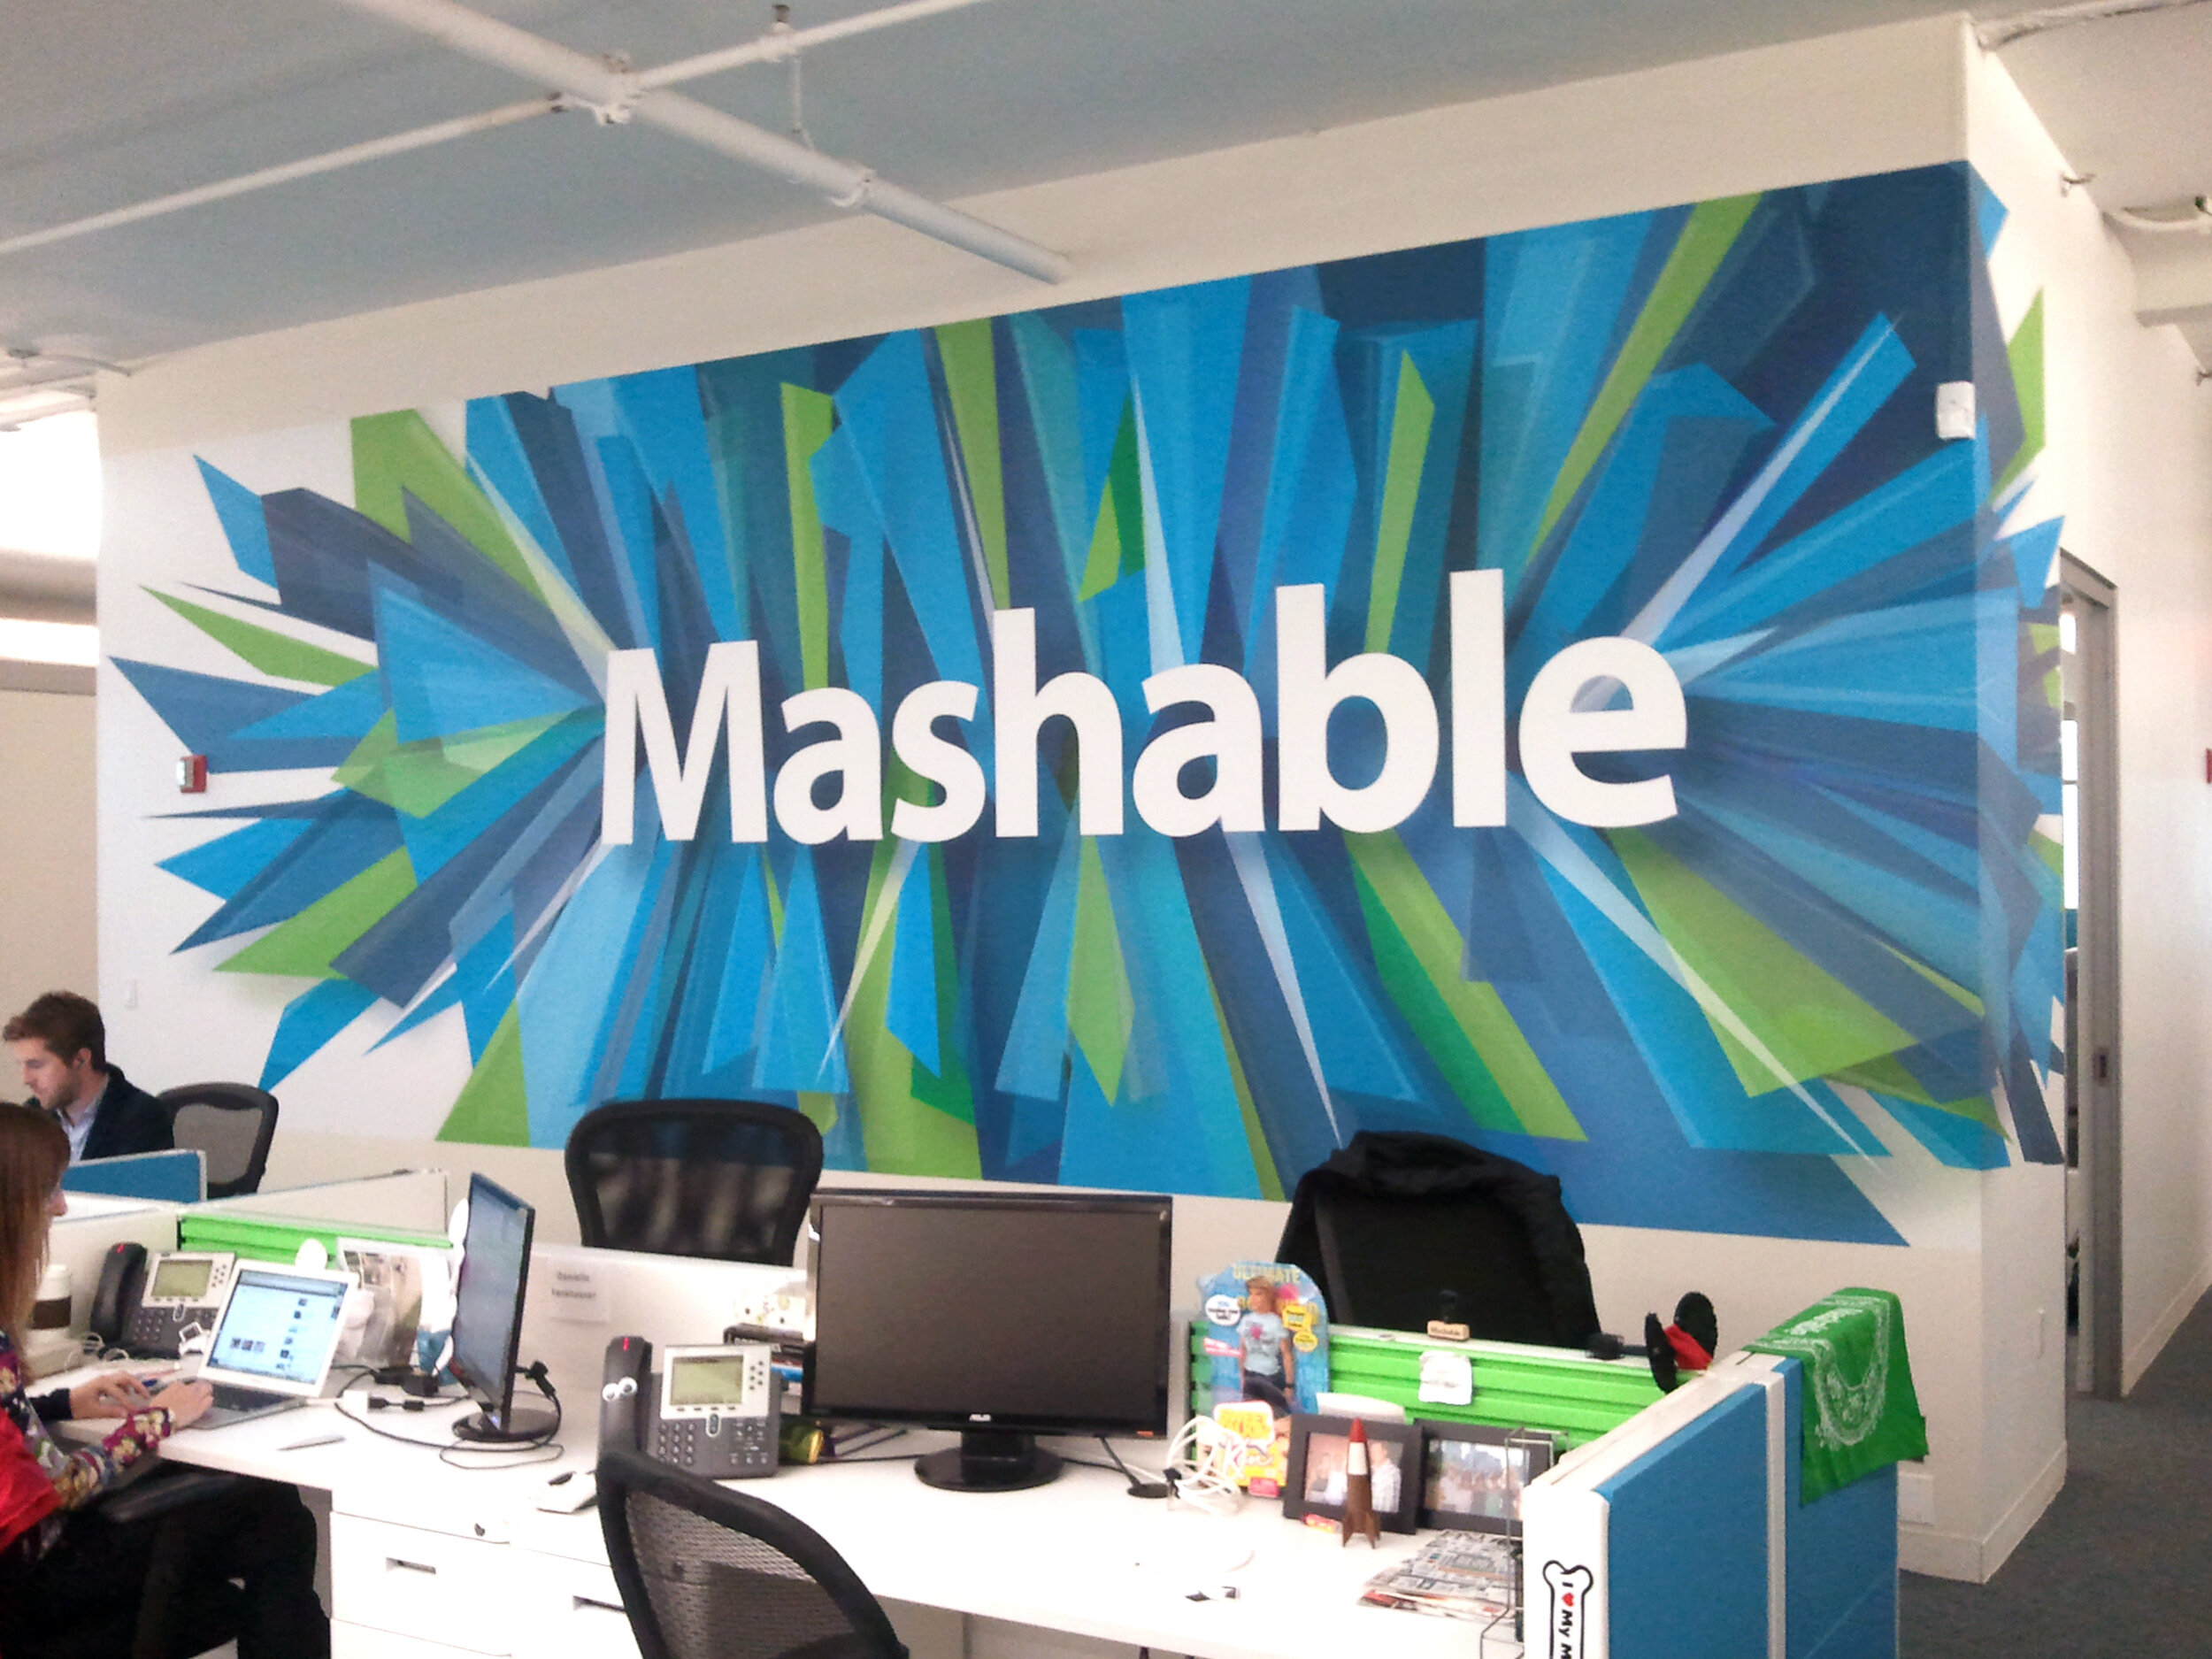 mashable-location2.jpg